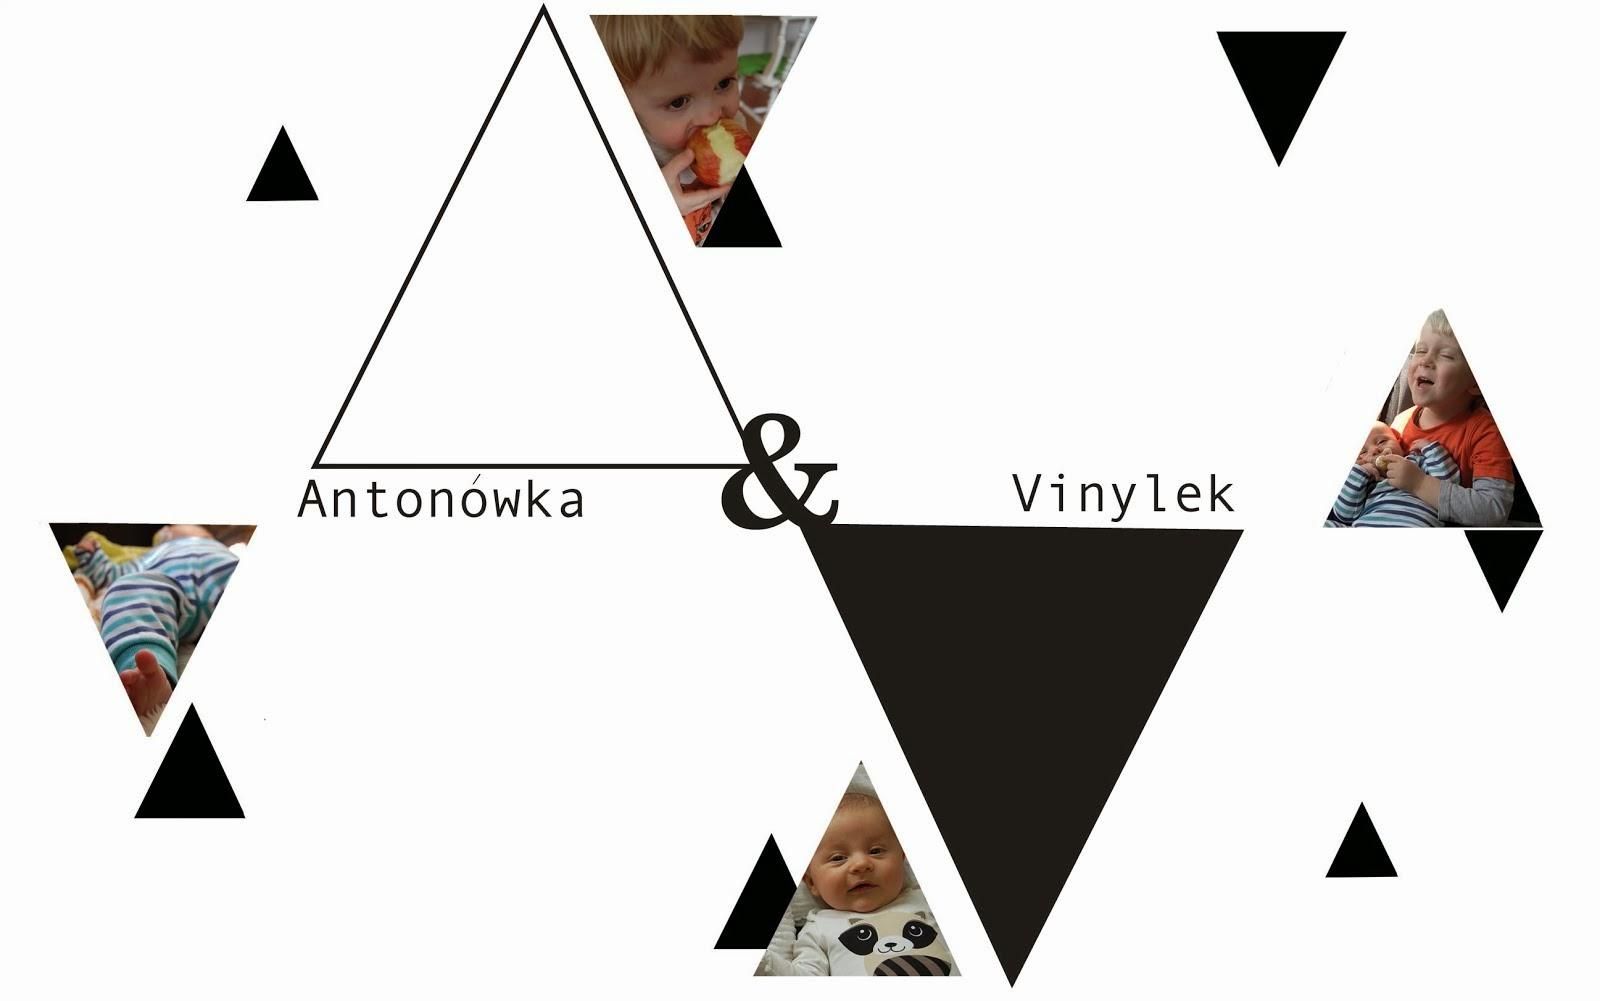 Antonowka & Vinylek